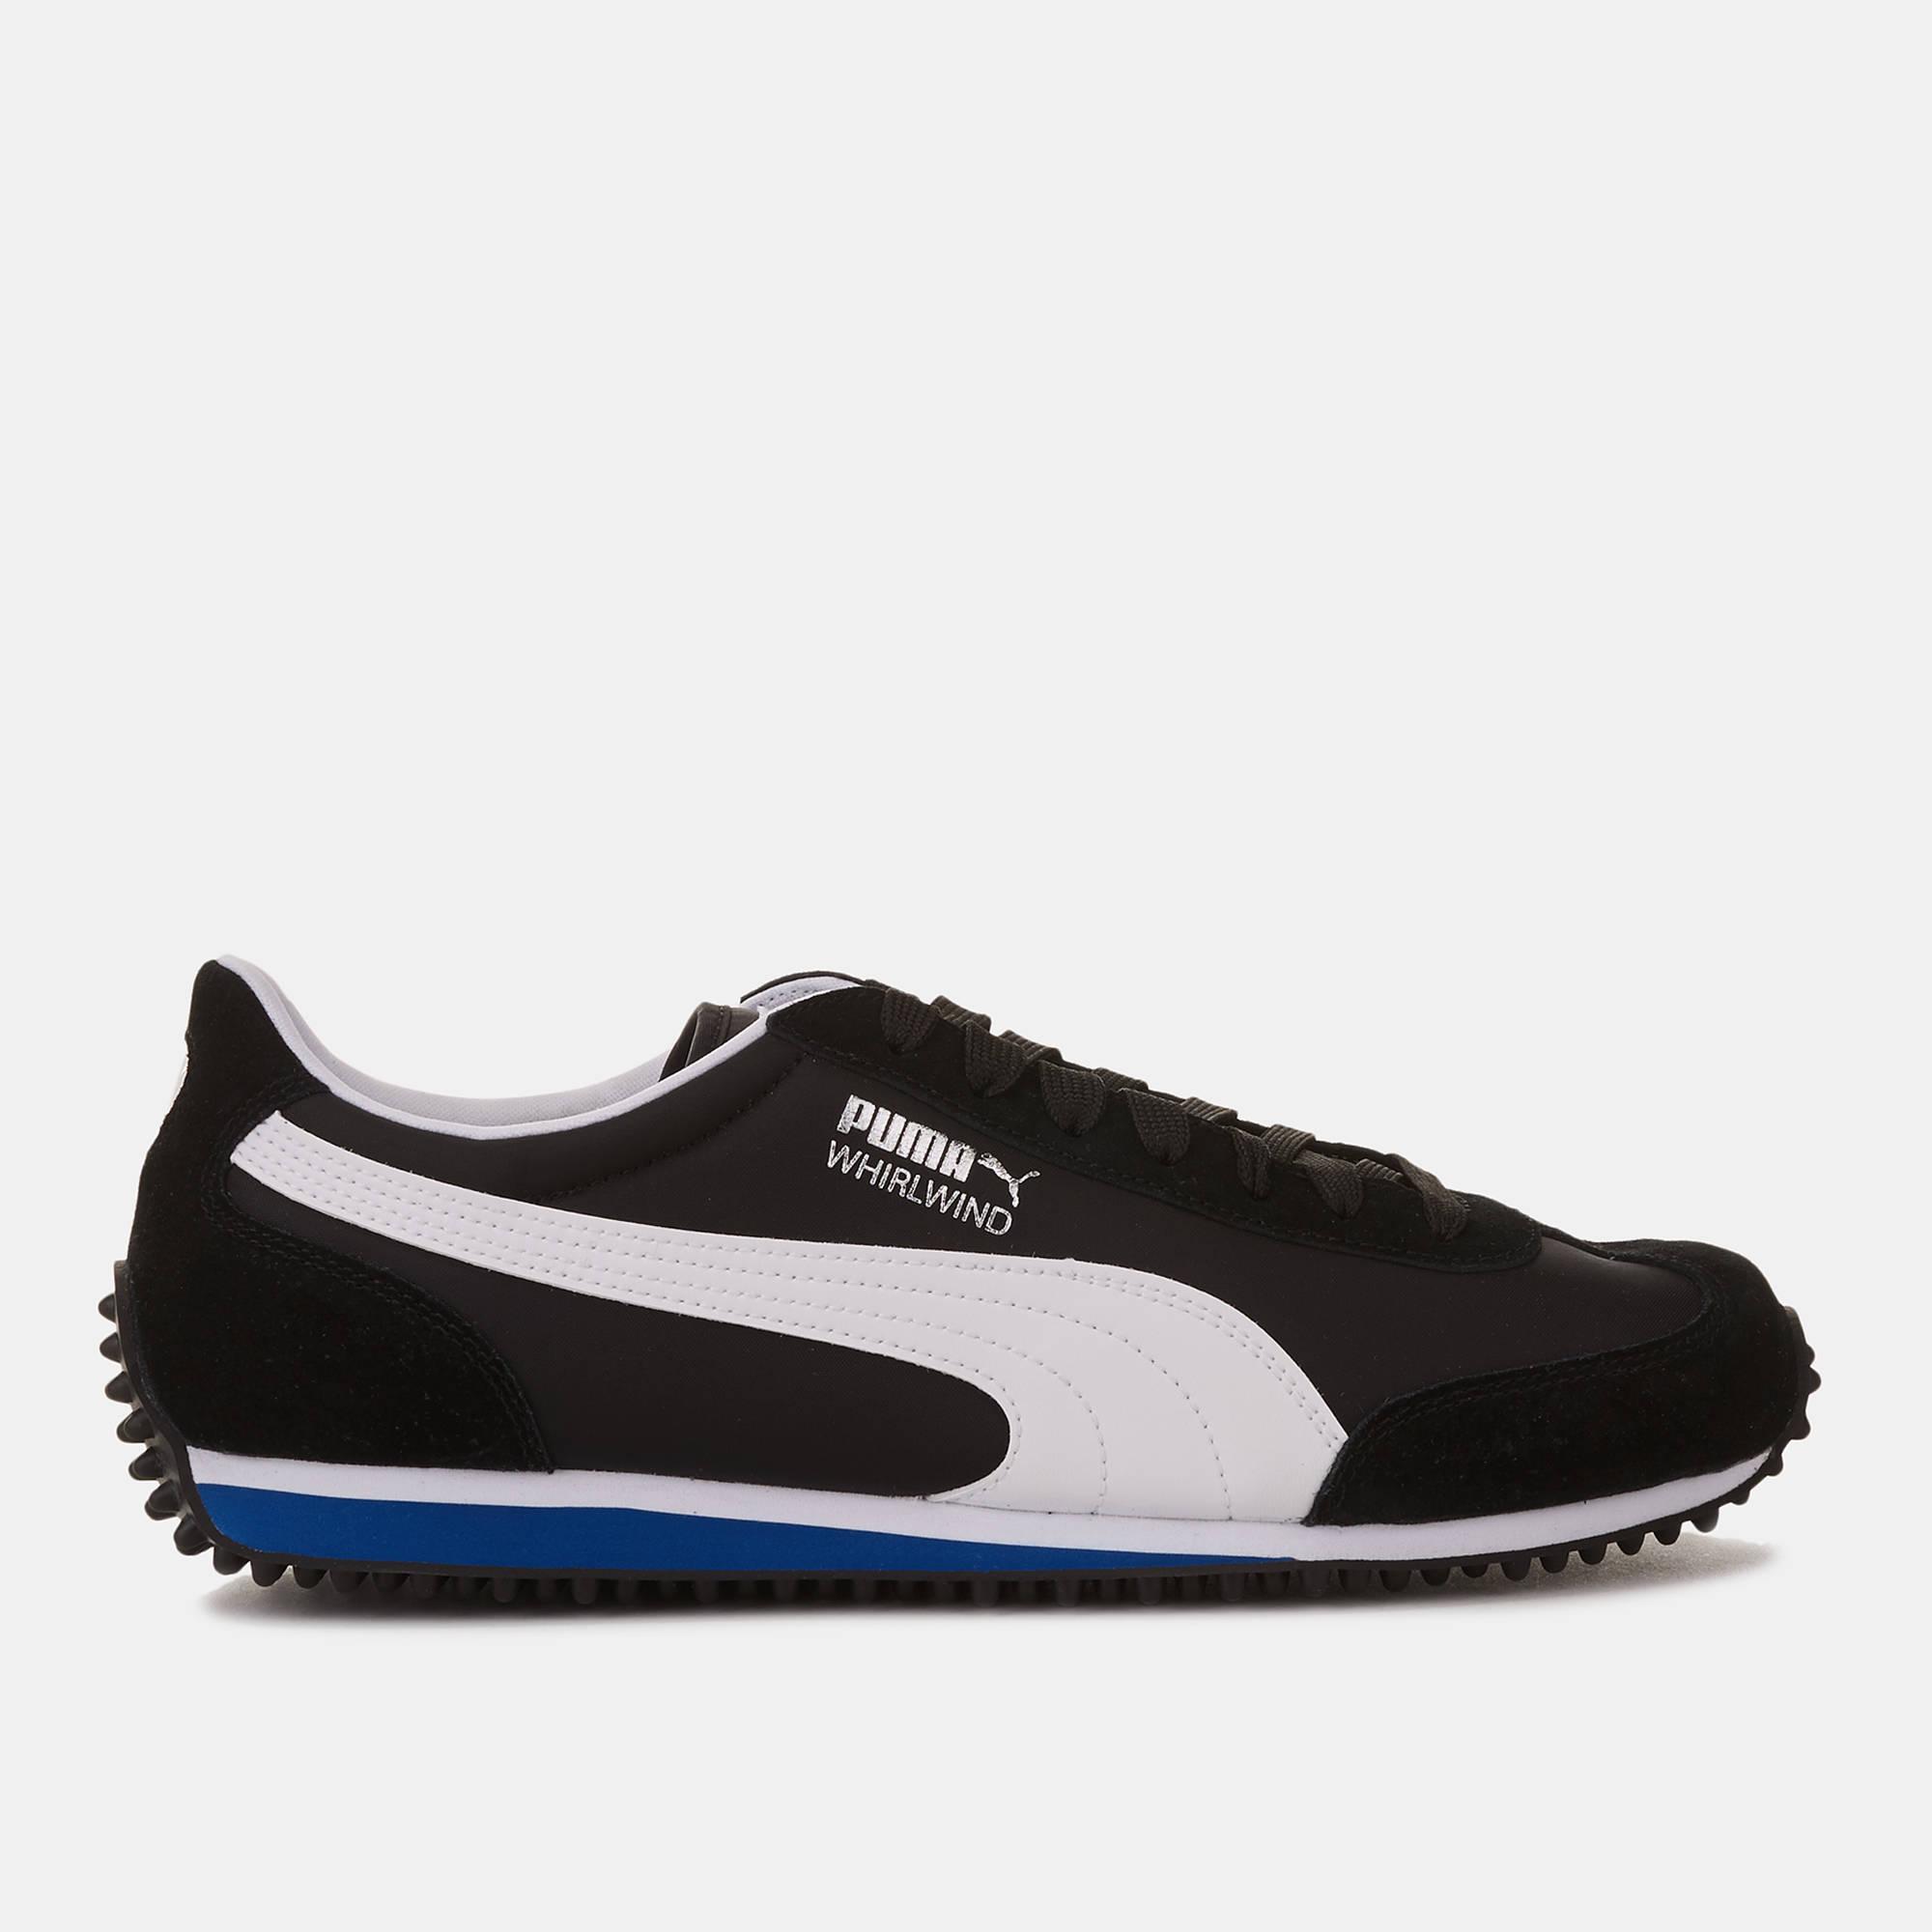 Puma whirlwind puma whirlwind classic sneaker shoe, ... JFPAHNT